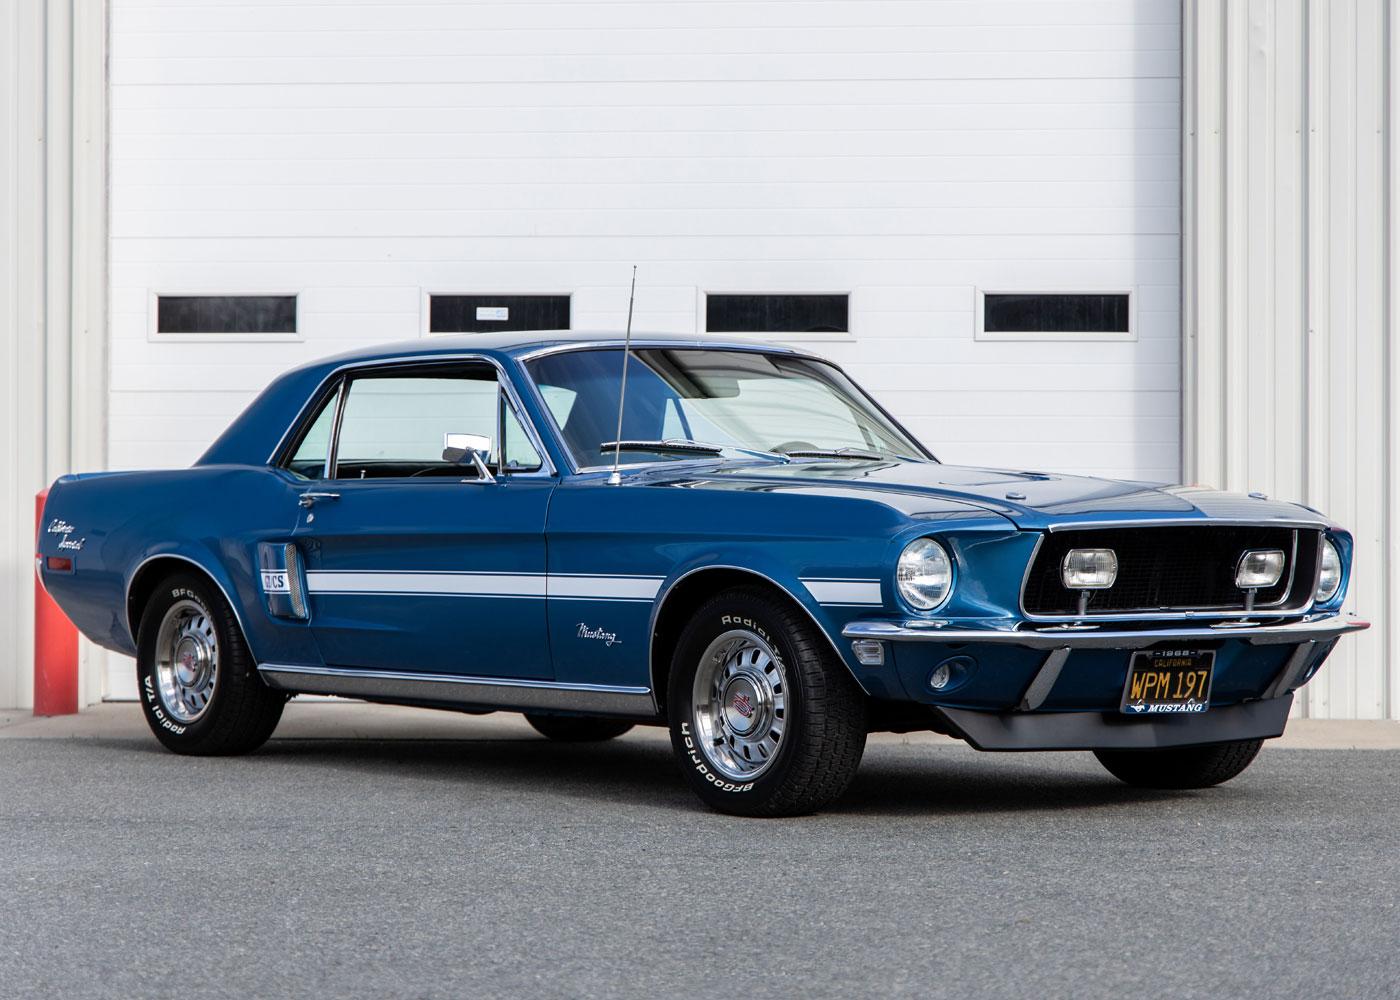 Ford Mustang Cailfornia Special